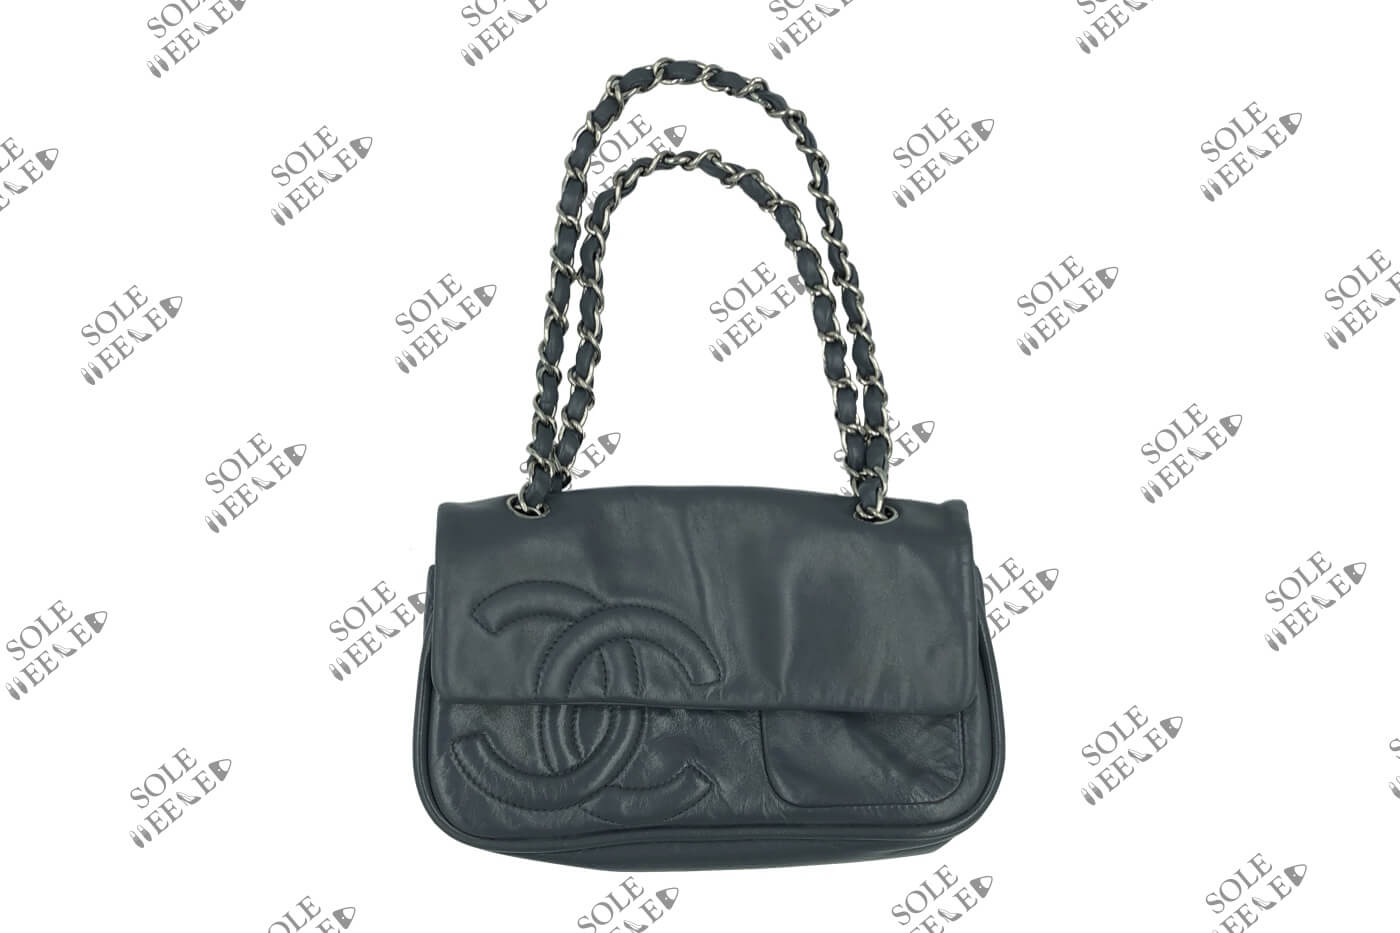 Chanel Handbag Colour Change